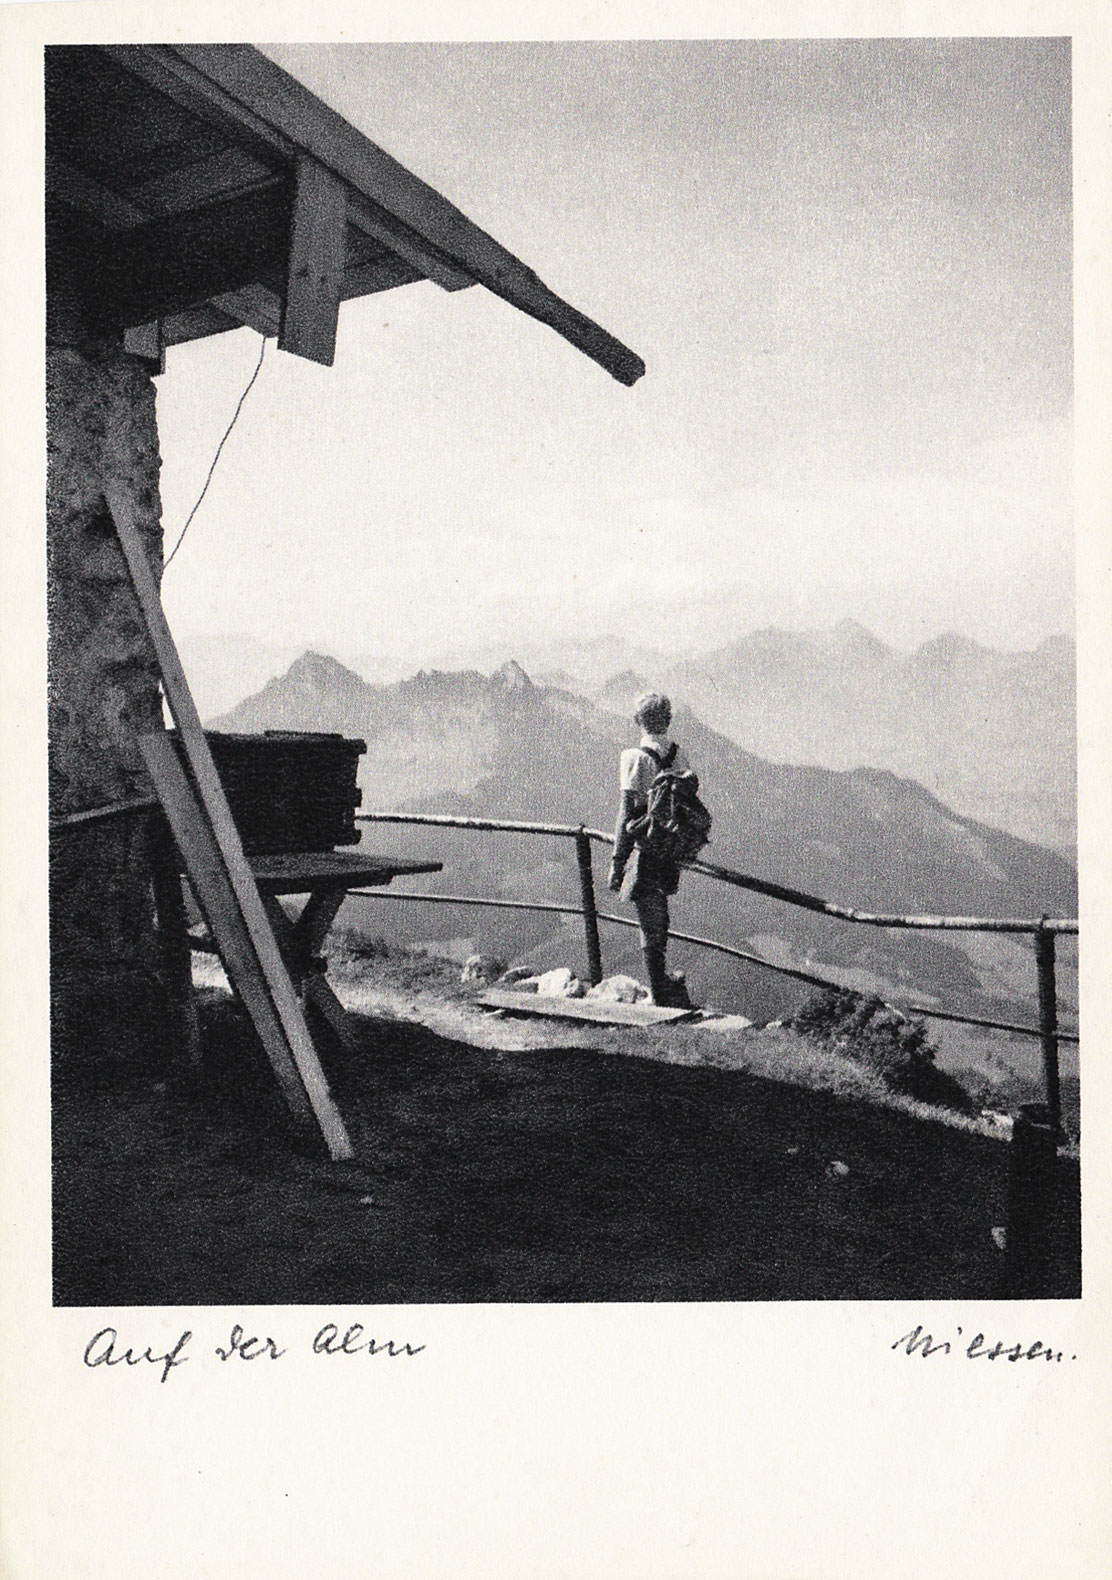 Boy overlooking mountains